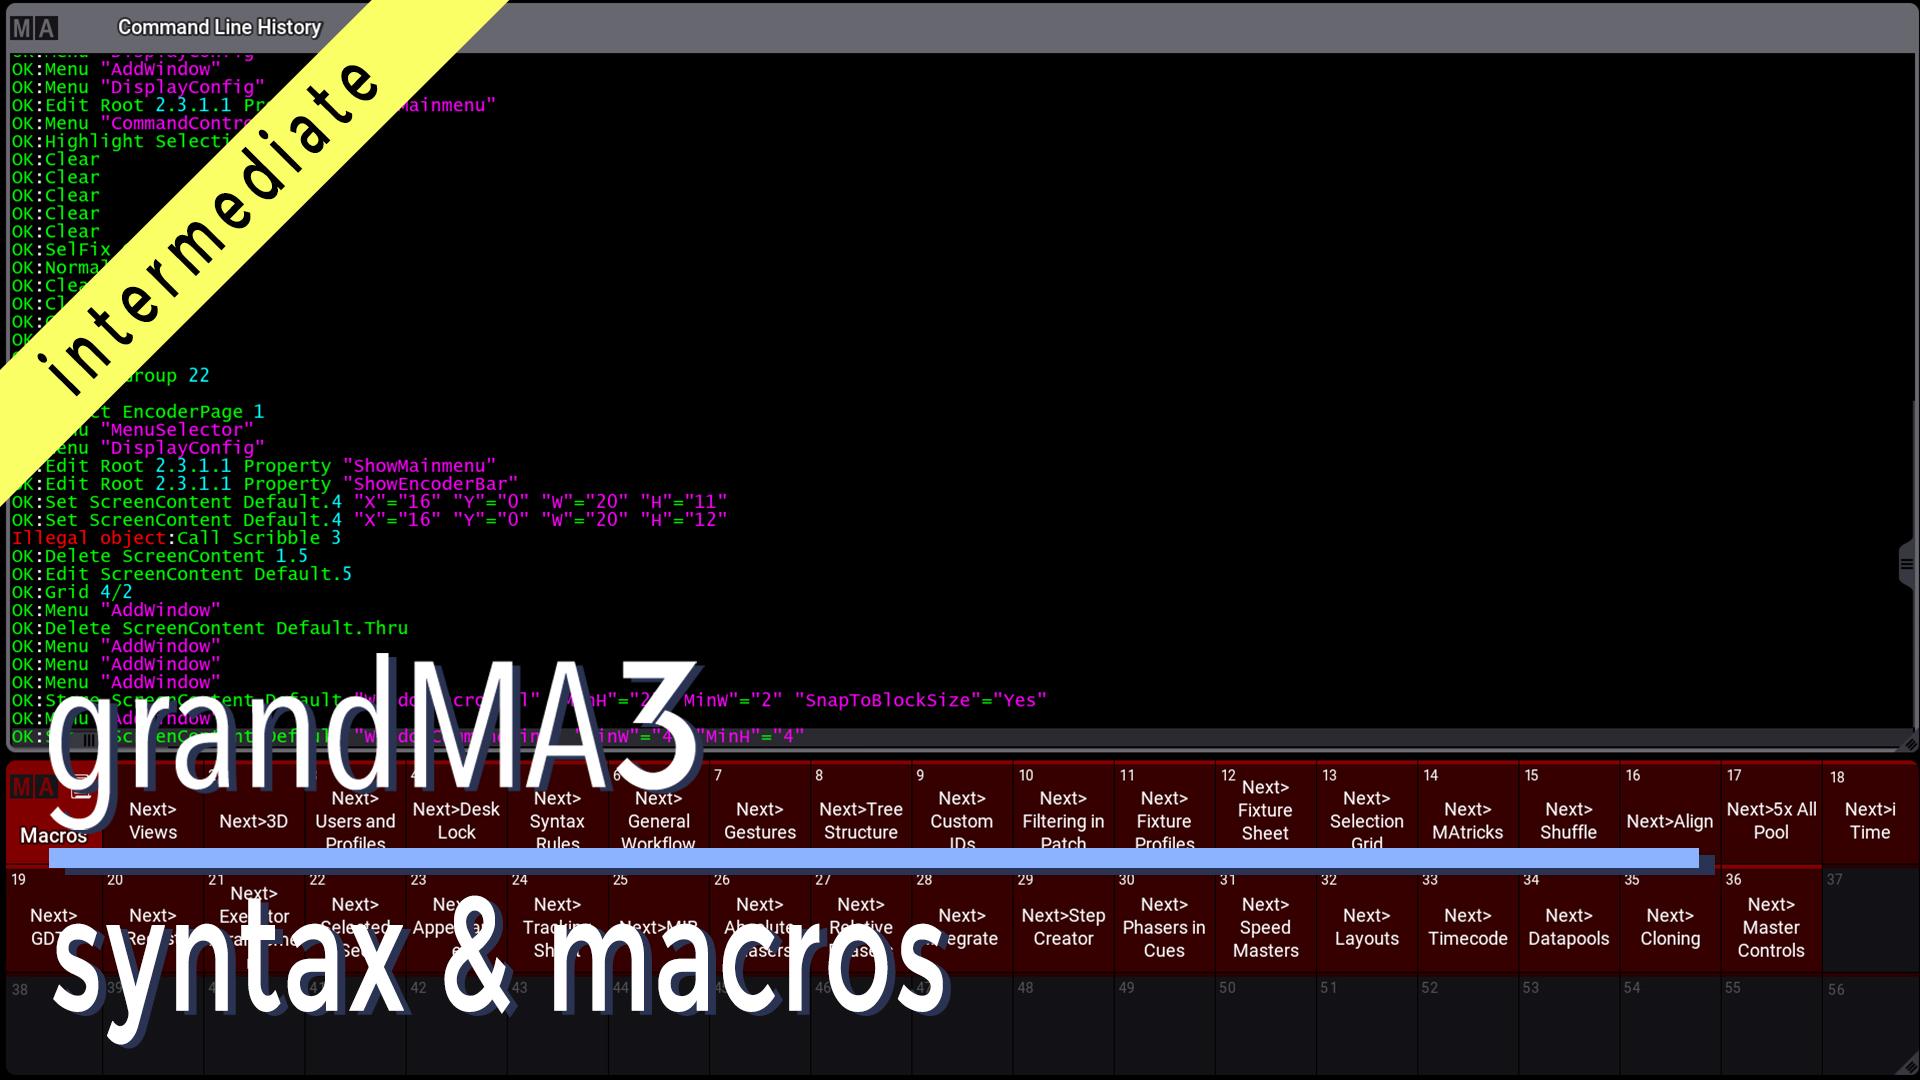 grandMA3 Syntax and Macros